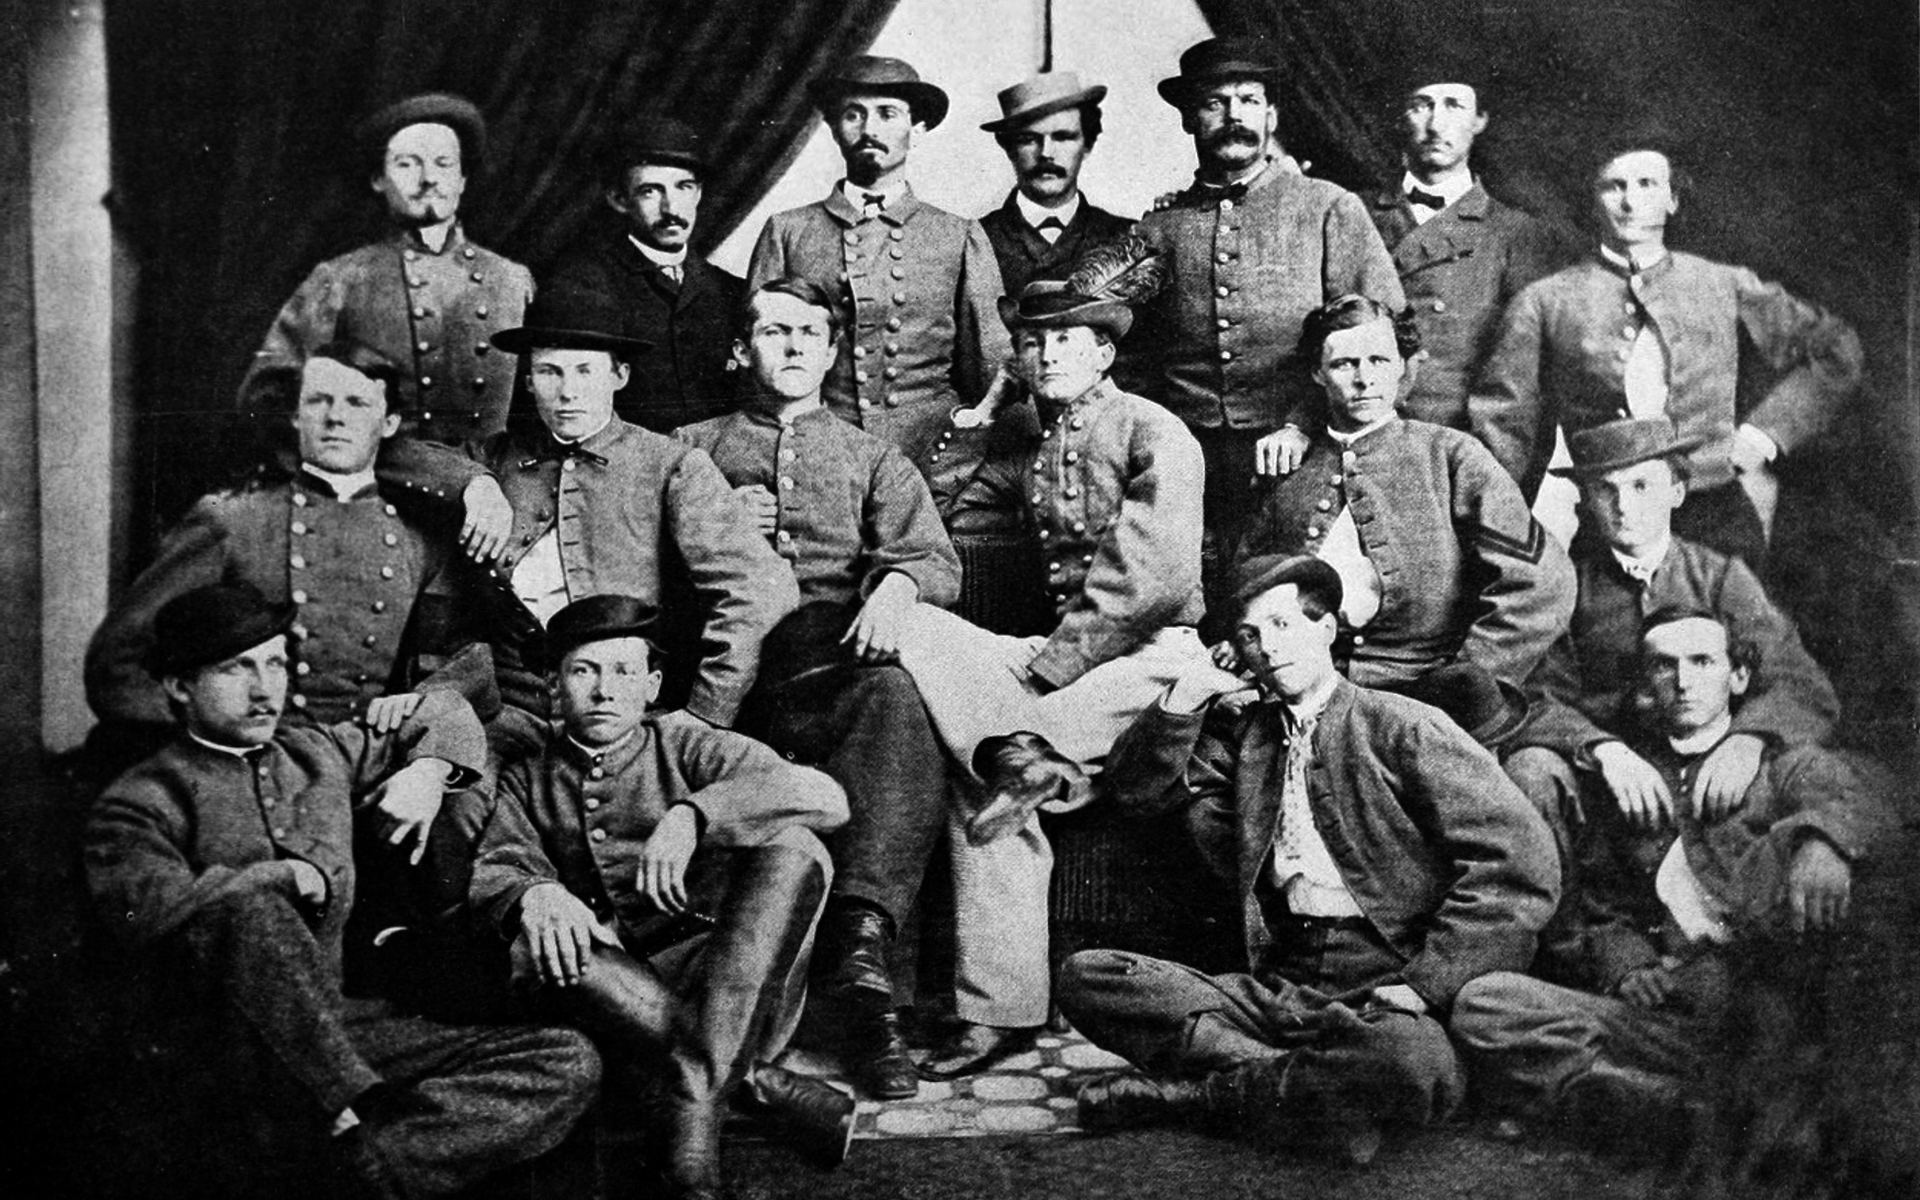 American civil war hd wallpaper background image - American civil war wallpaper ...